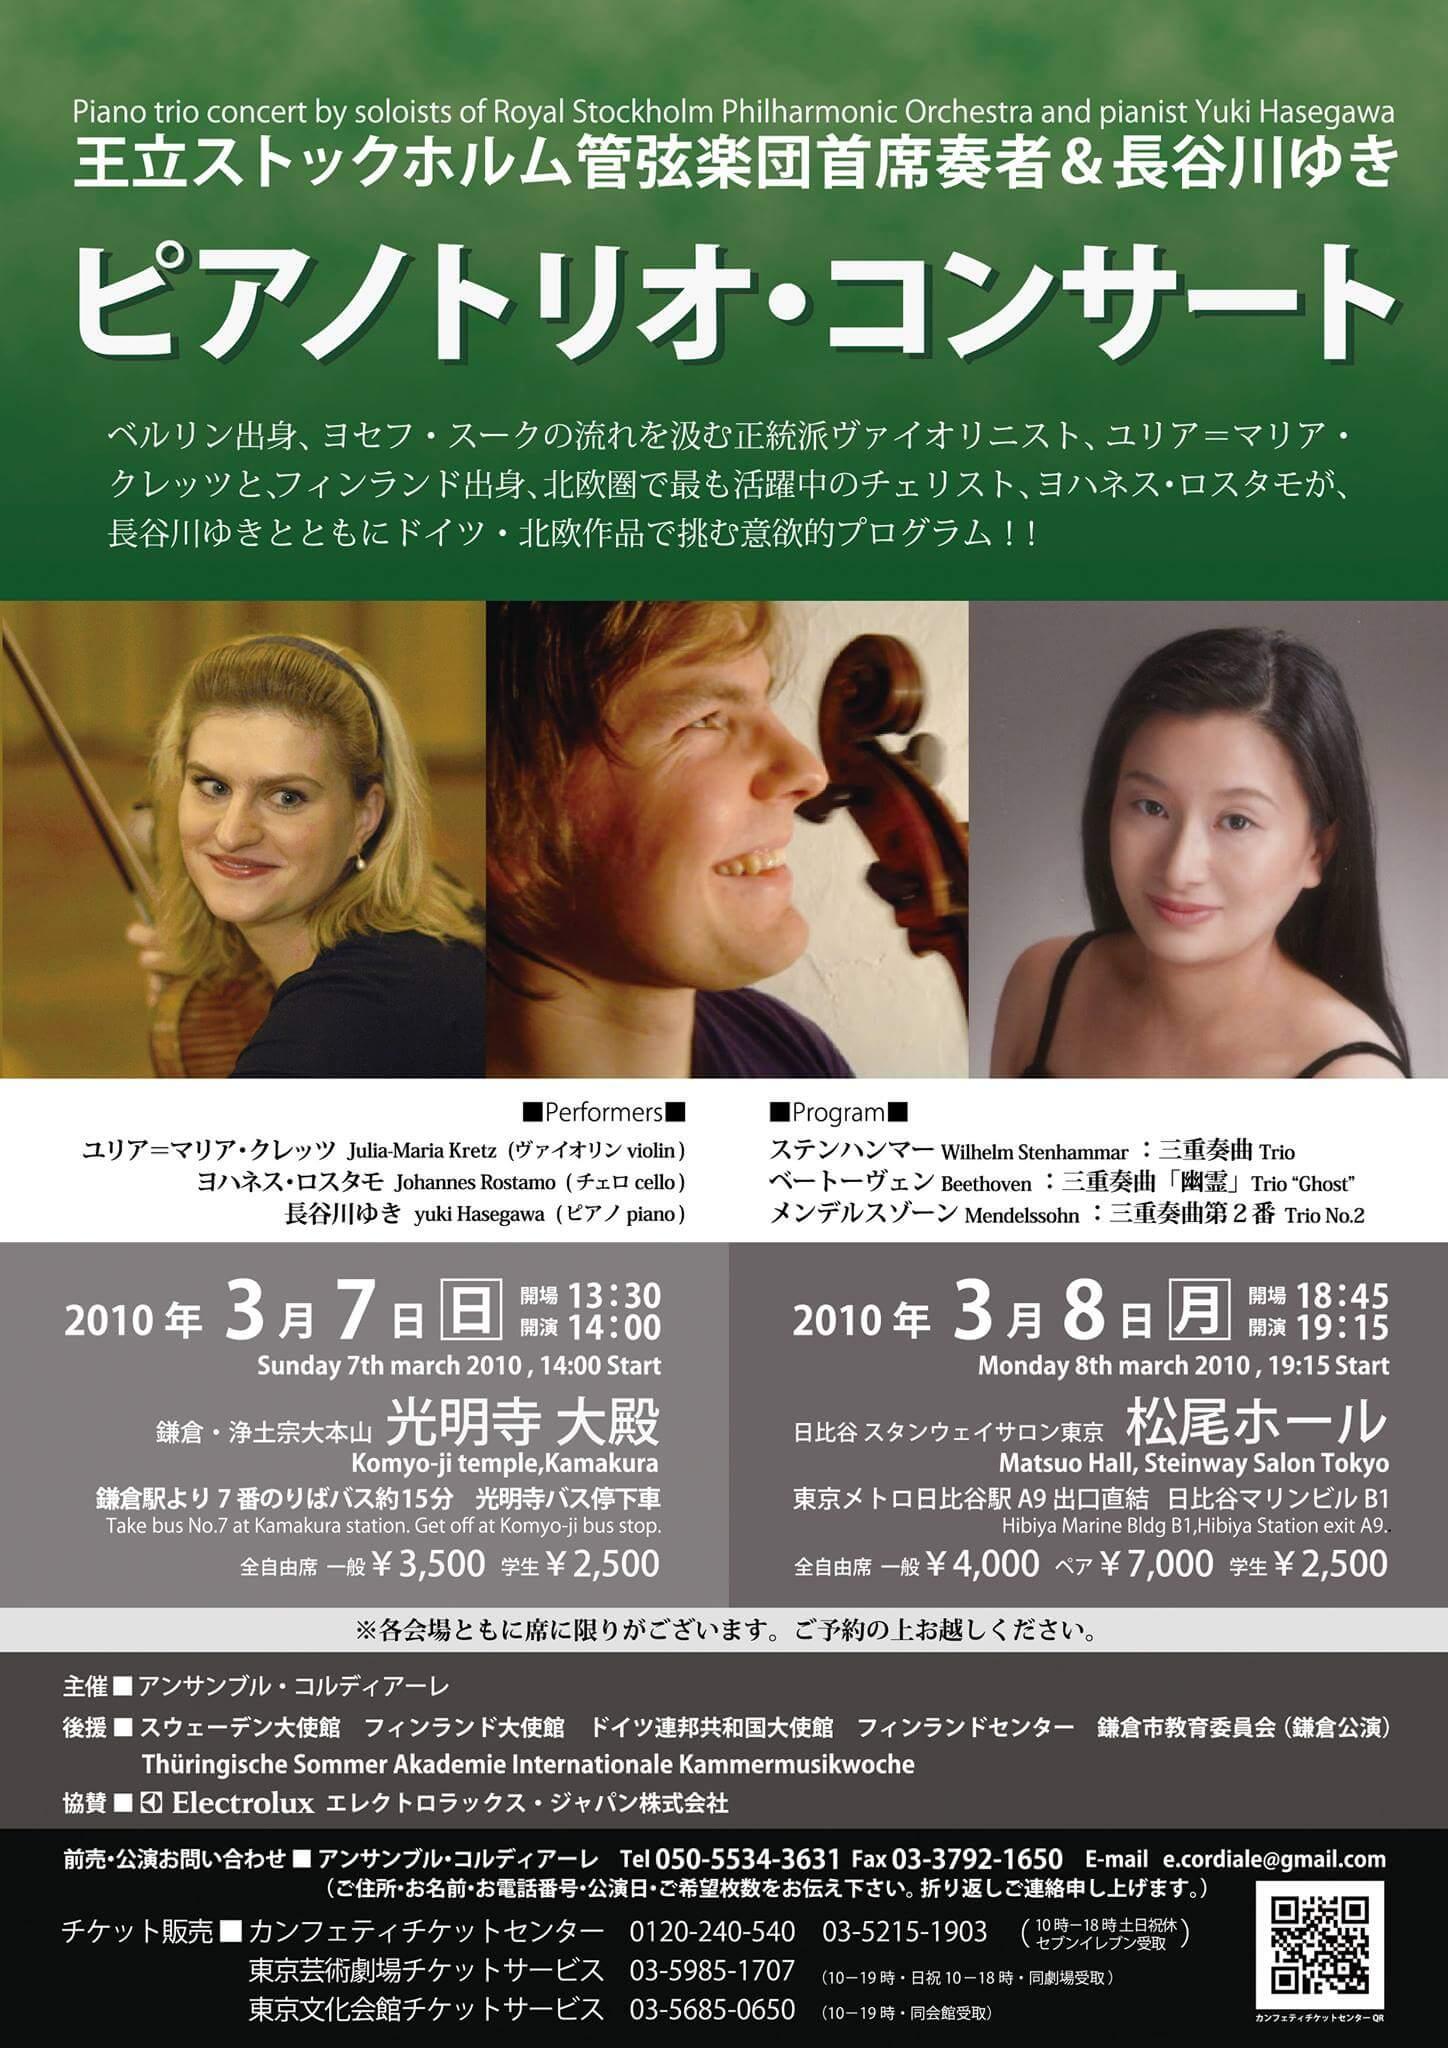 Principal Player of the Royal Stockholm Orchestra / Yuki Hasegawa Piano Trio